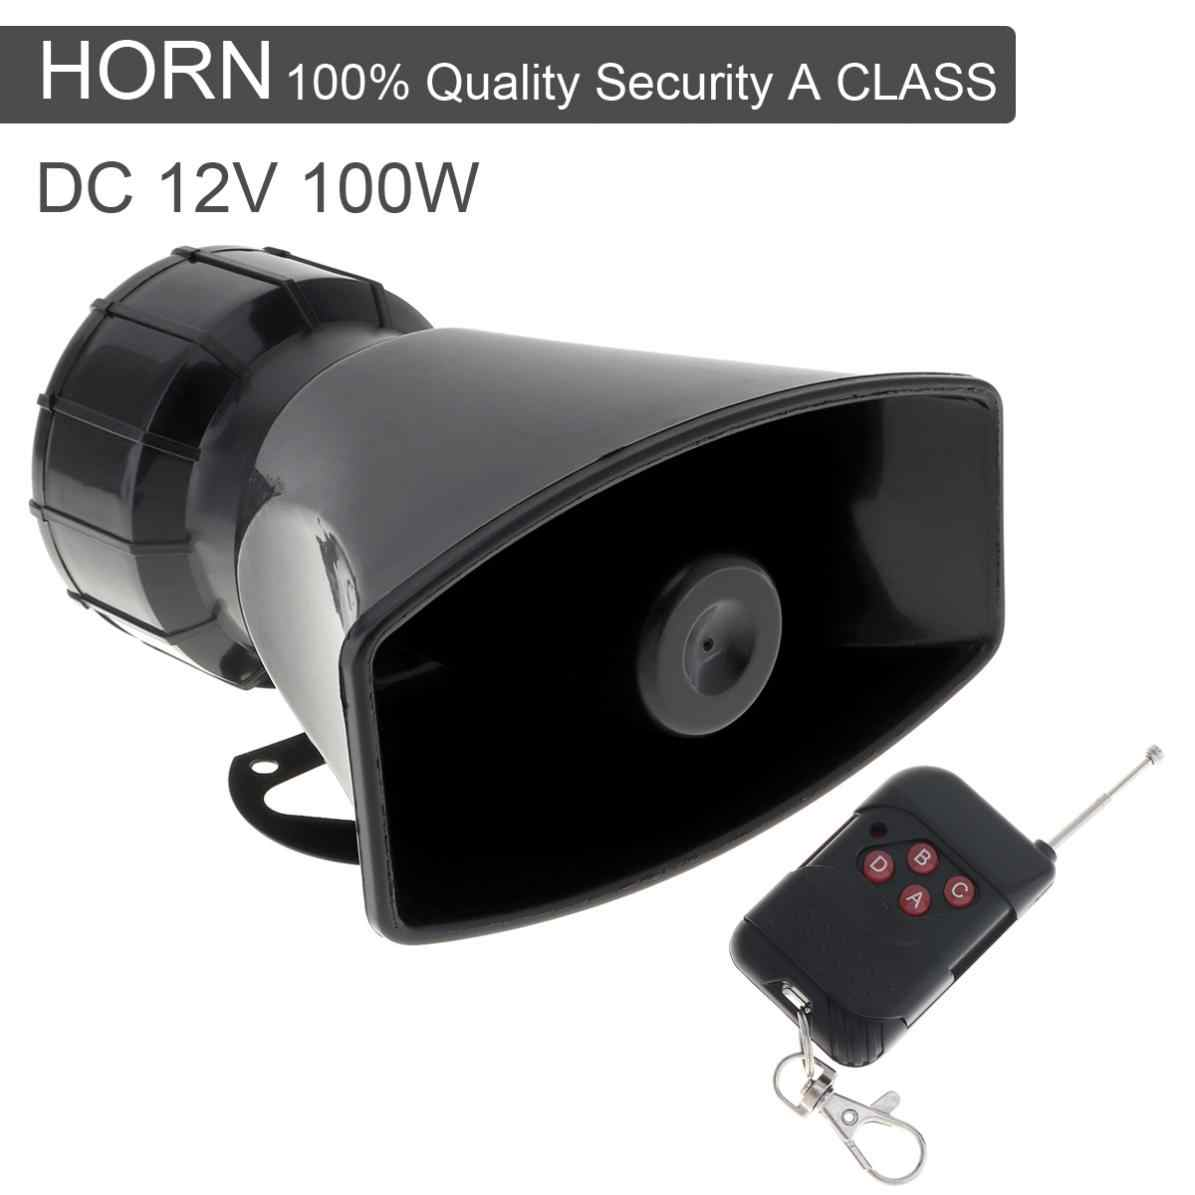 12V 100W 7 Sound Tones Loud Horn Motor Auto Car Vehicle